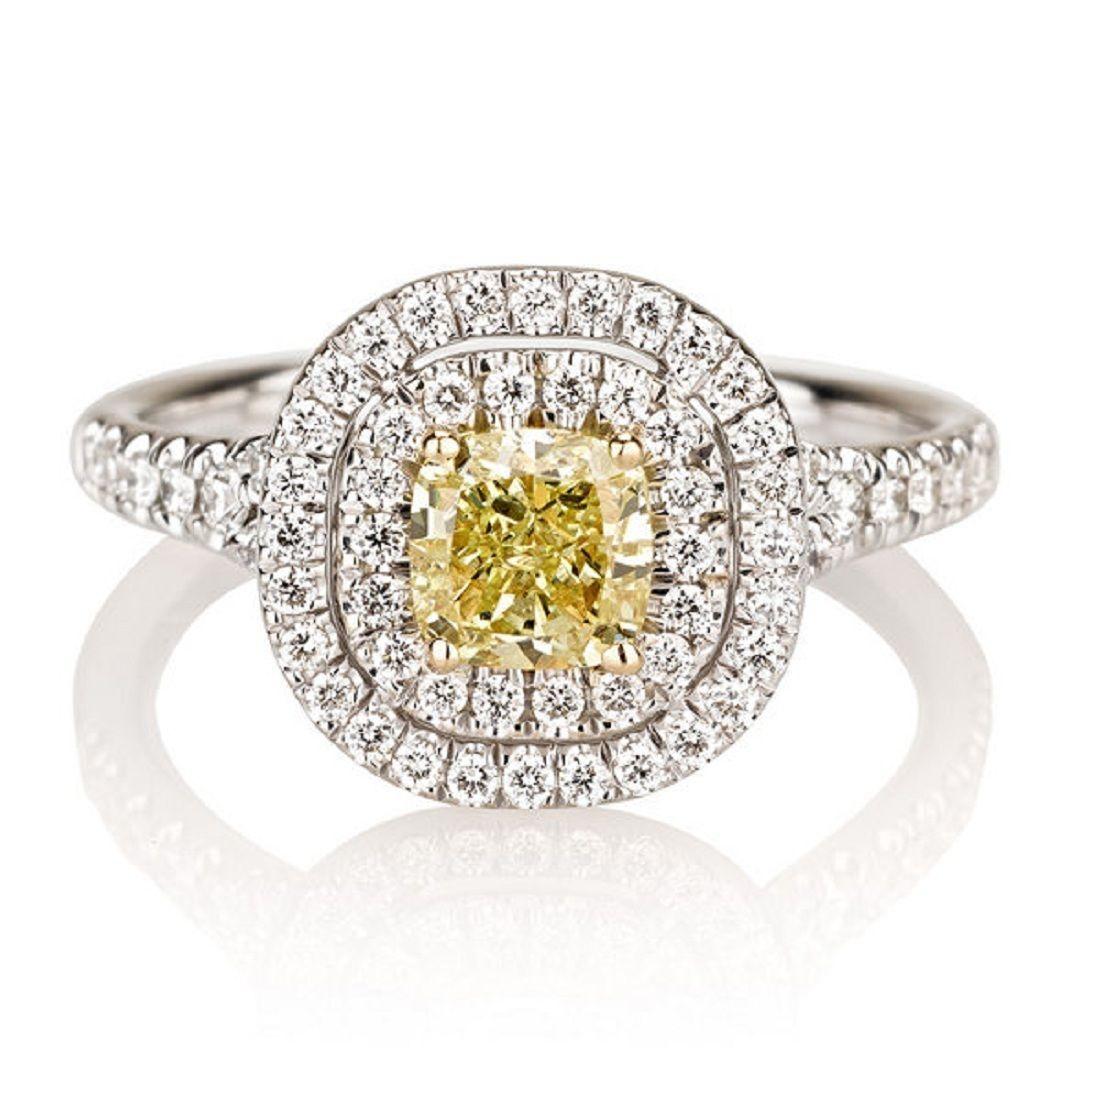 Intelligent 7mm Platinum Plated Silver 1.5ct Cz Half Bezel Wedding Engagement Ring Size8 Engagement & Wedding Jewelry & Watches